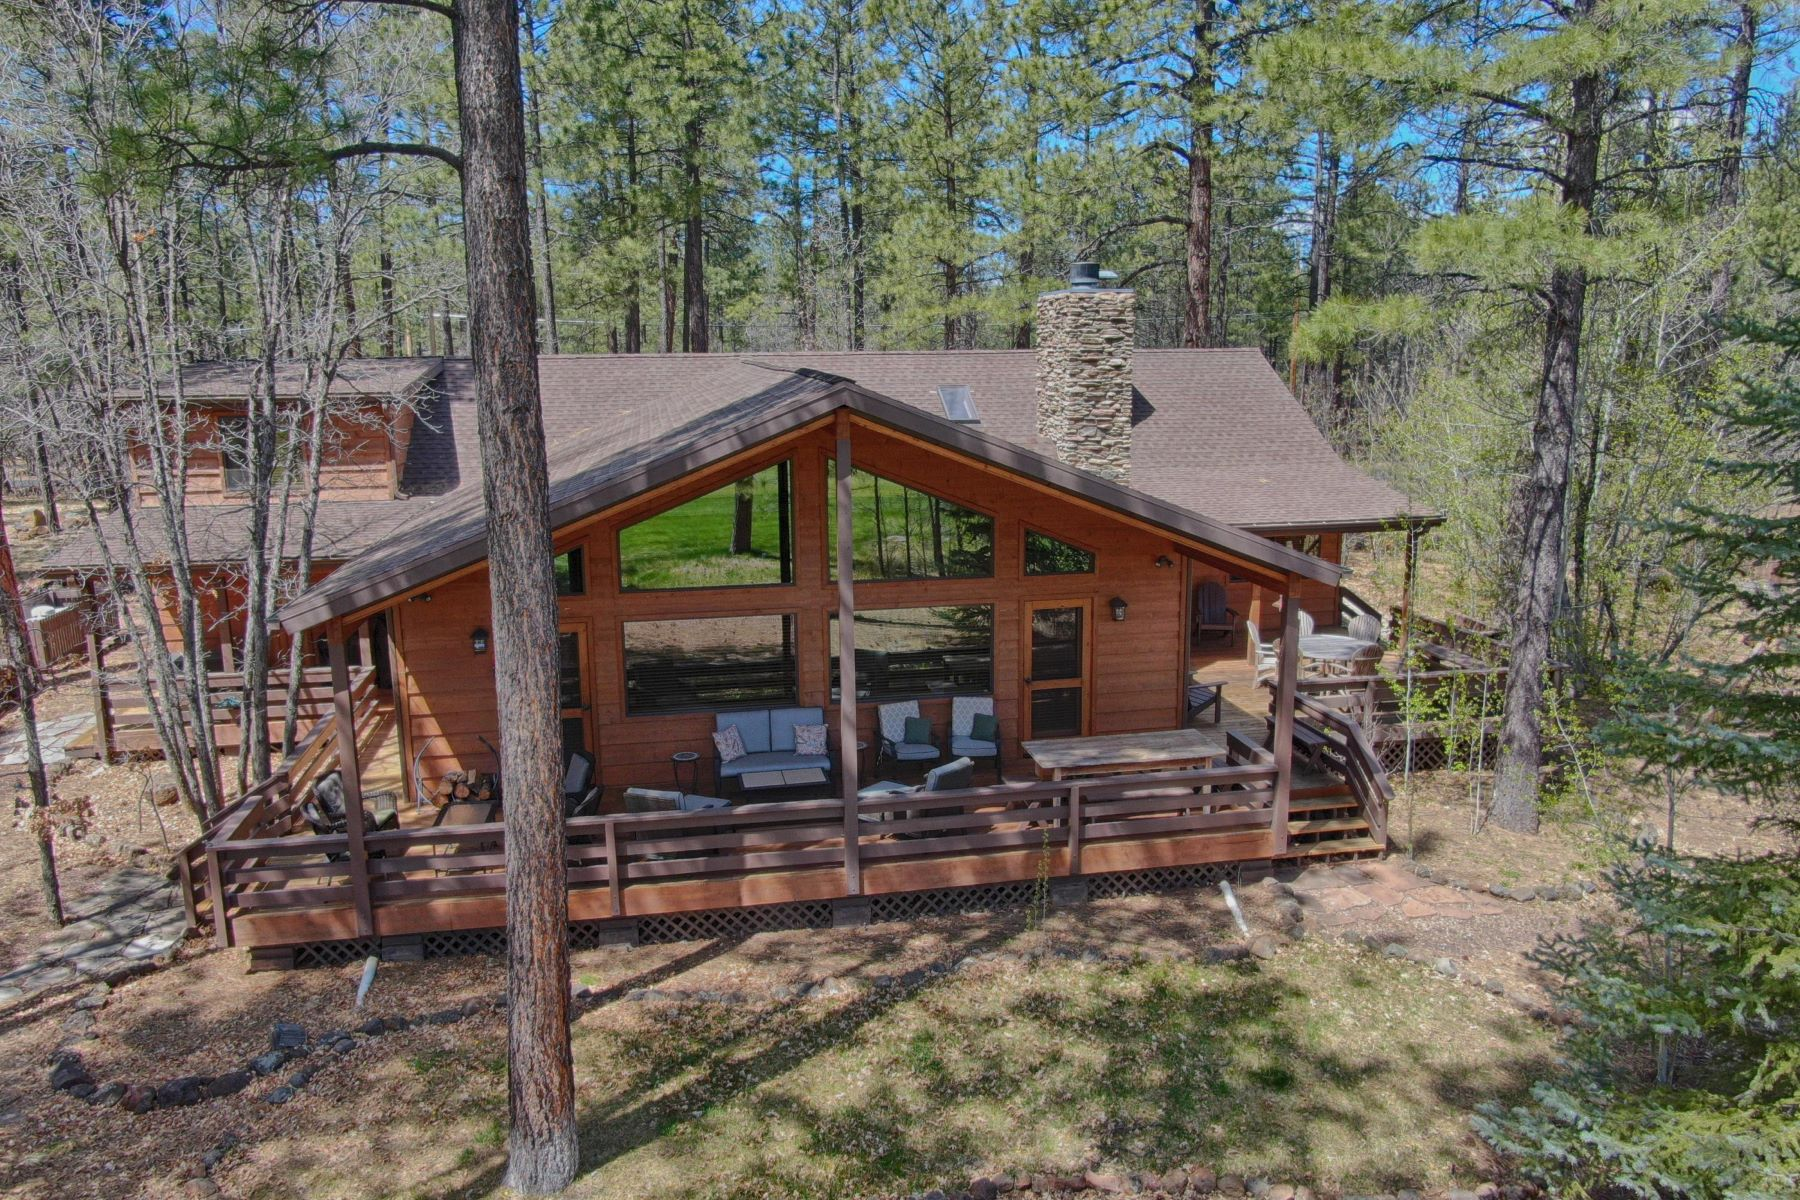 Single Family Homes για την Πώληση στο White Mountain Summer Homes 3365 Aspen LN, Pinetop, Αριζονα 85935 Ηνωμένες Πολιτείες